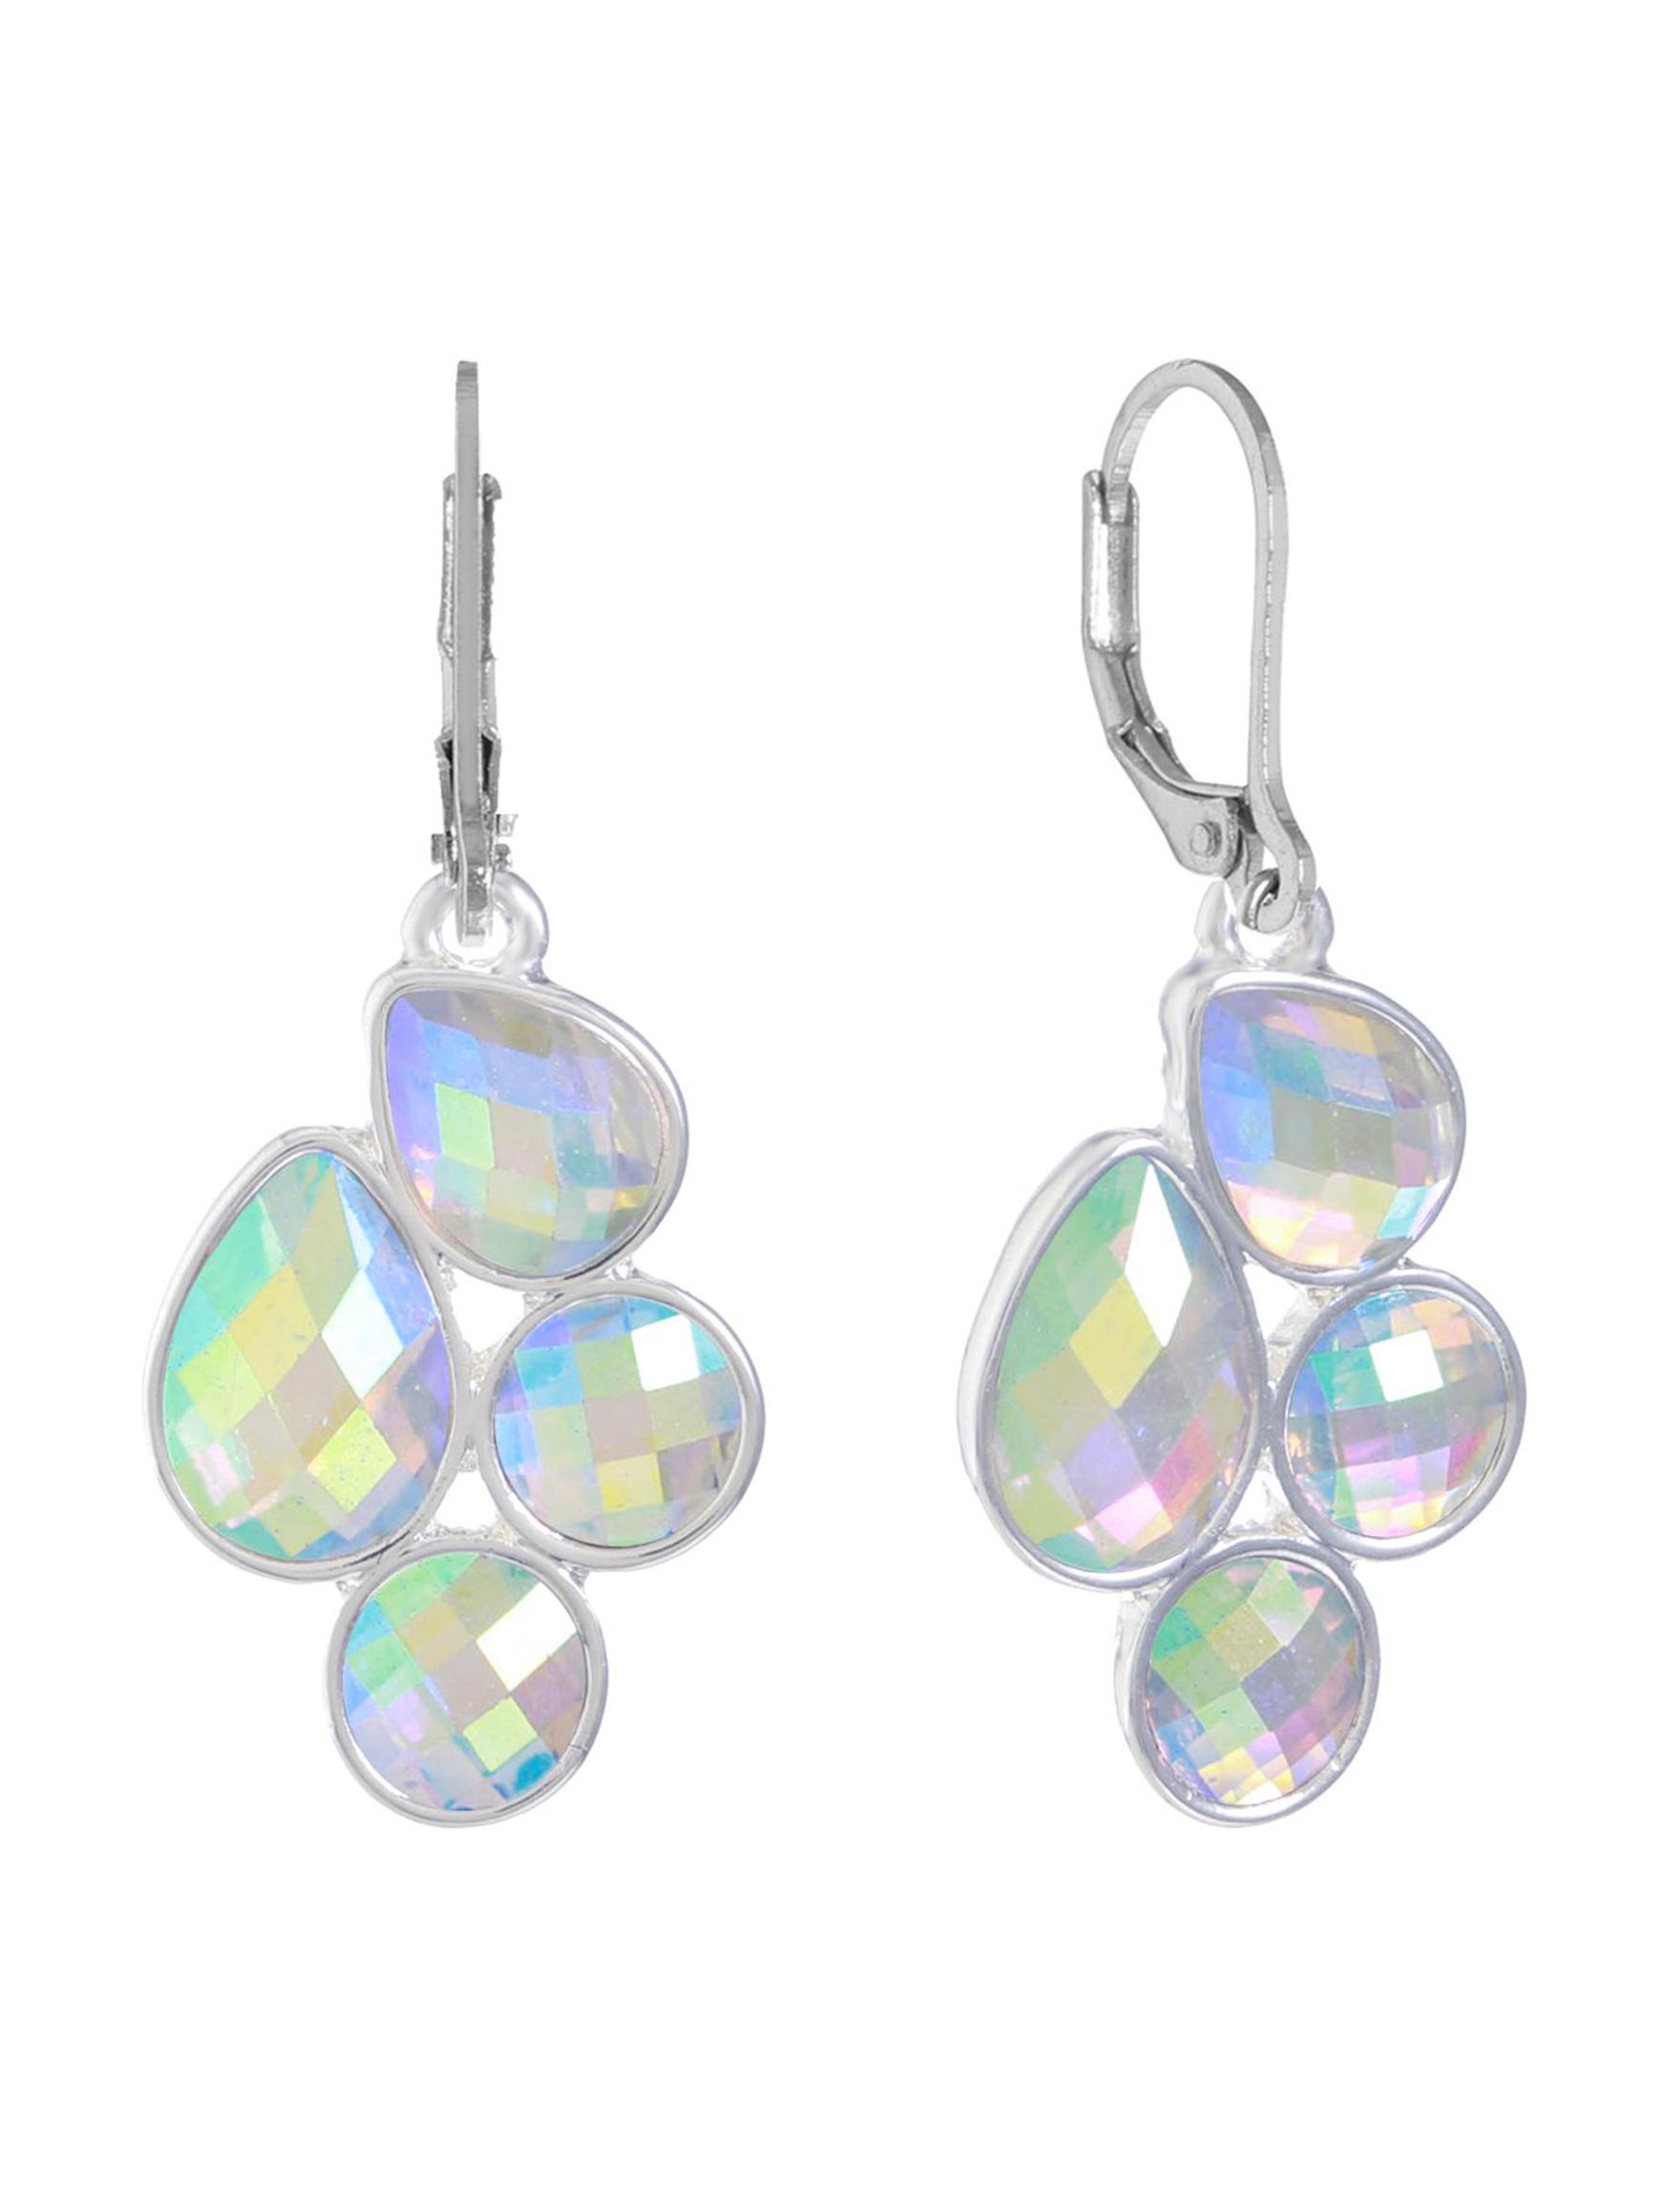 Gloria Vanderbilt Silver / Crystal Drops Earrings Fashion Jewelry